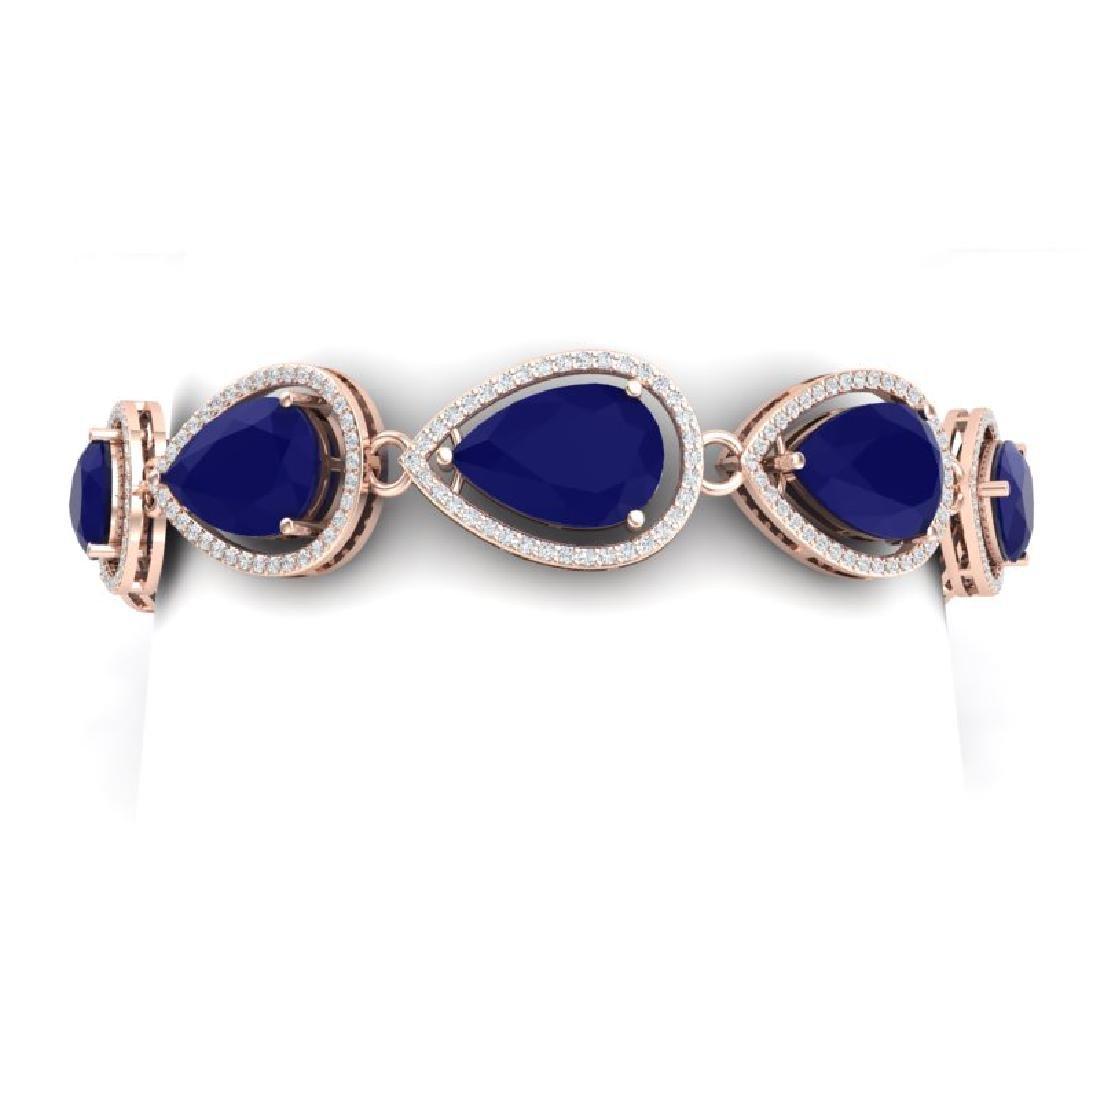 28.31 CTW Royalty Sapphire & VS Diamond Bracelet 18K